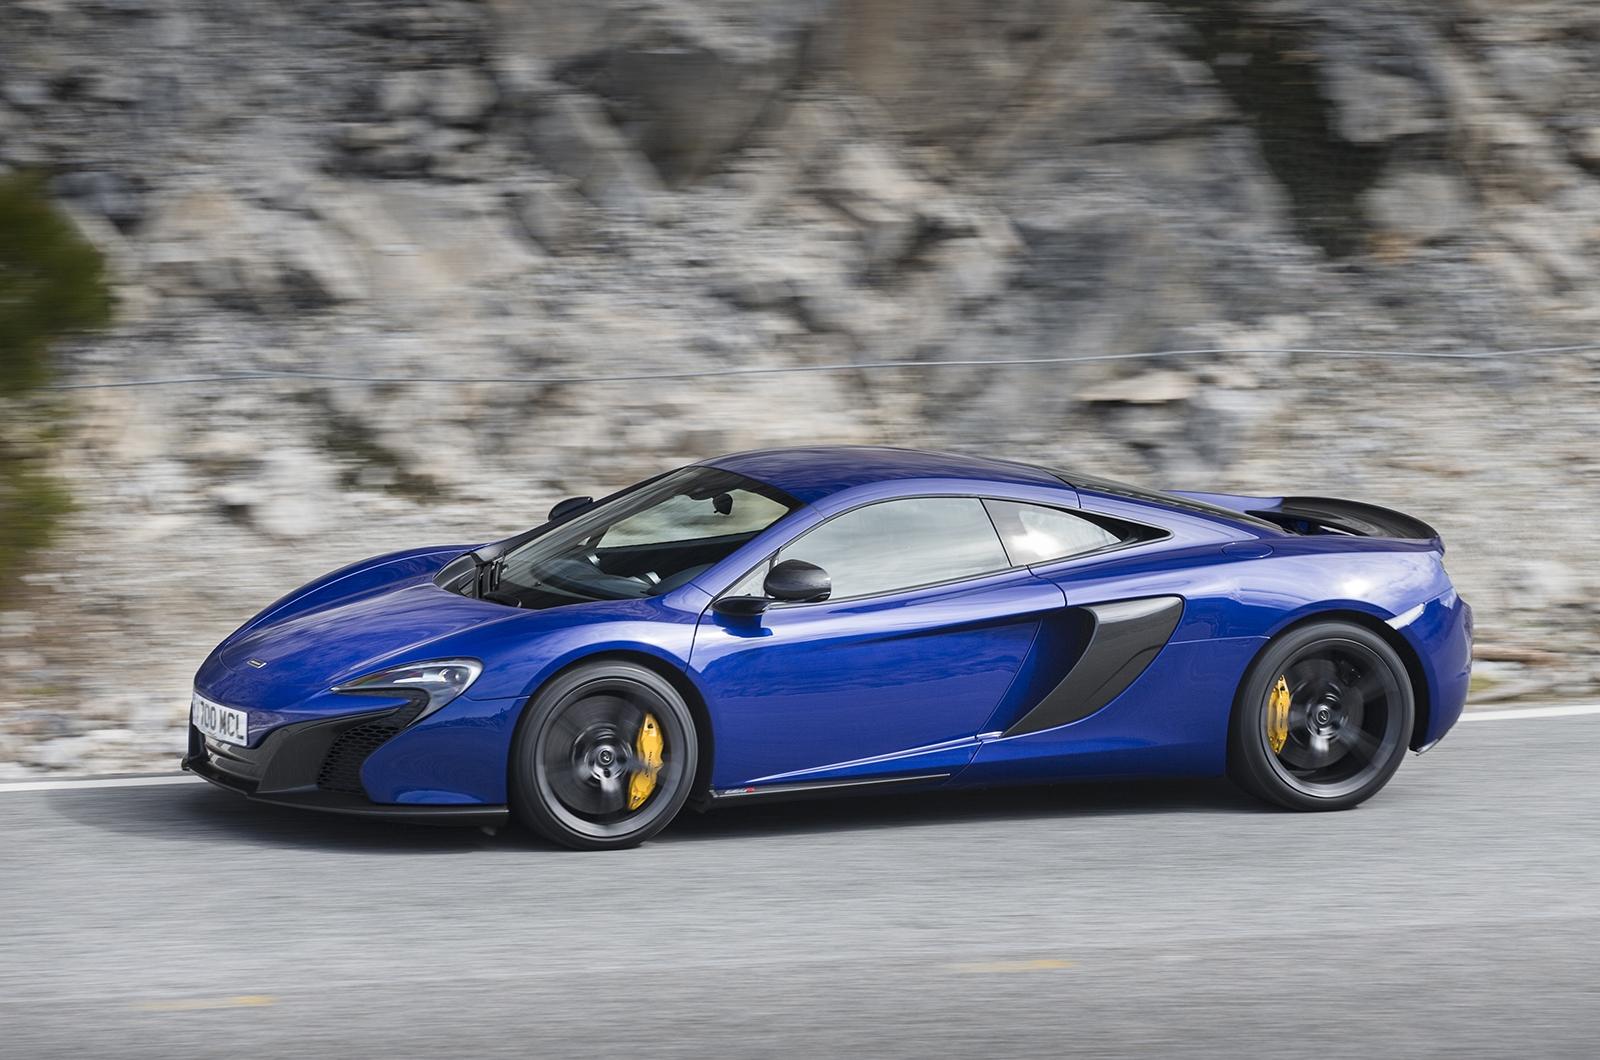 mclaren 650s blue. image with 2014 mclaren 650s coupe mclaren 650s blue a